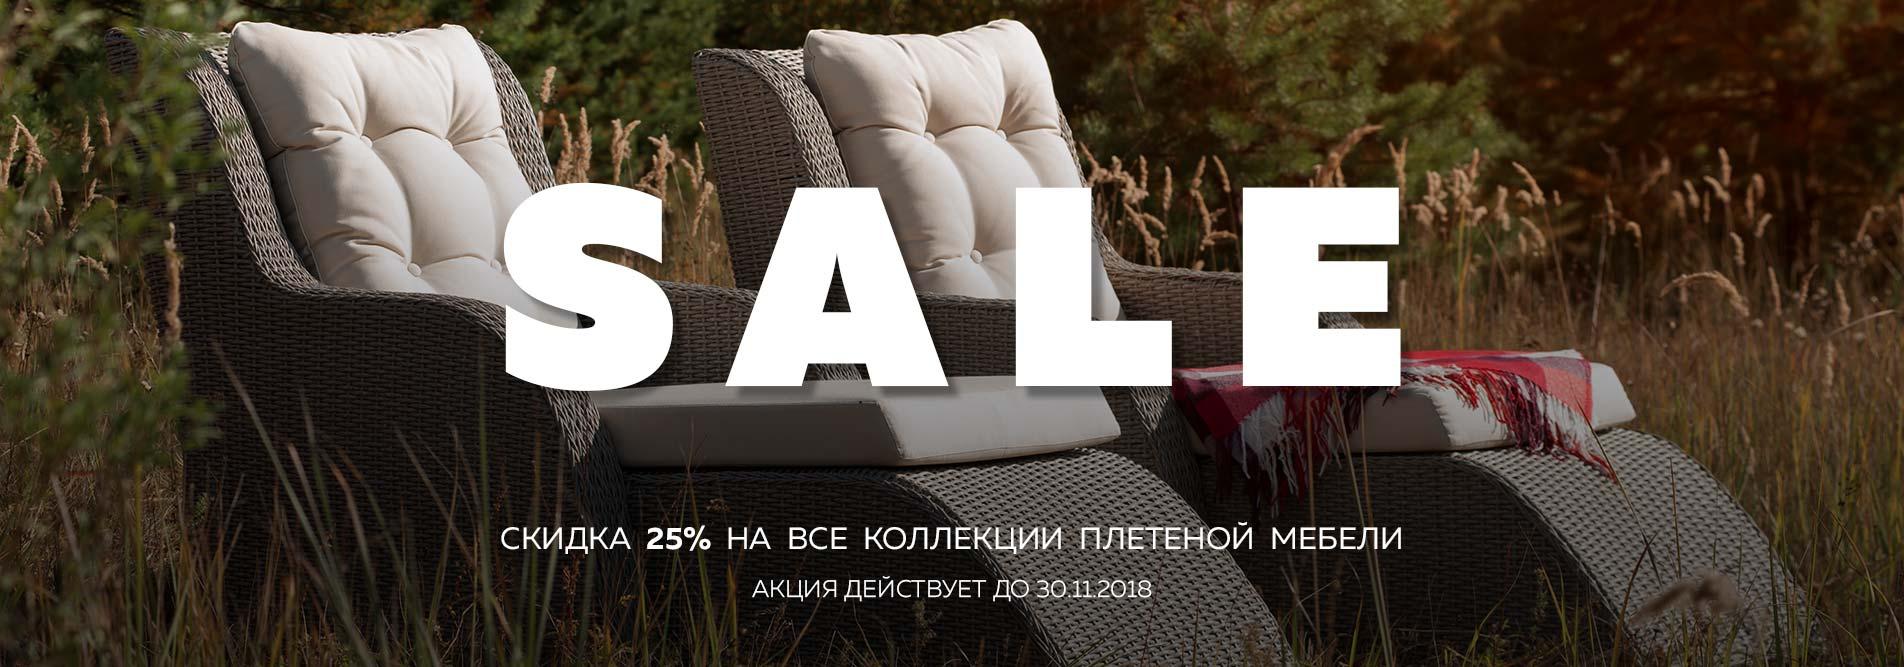 распродажа мебели, фото